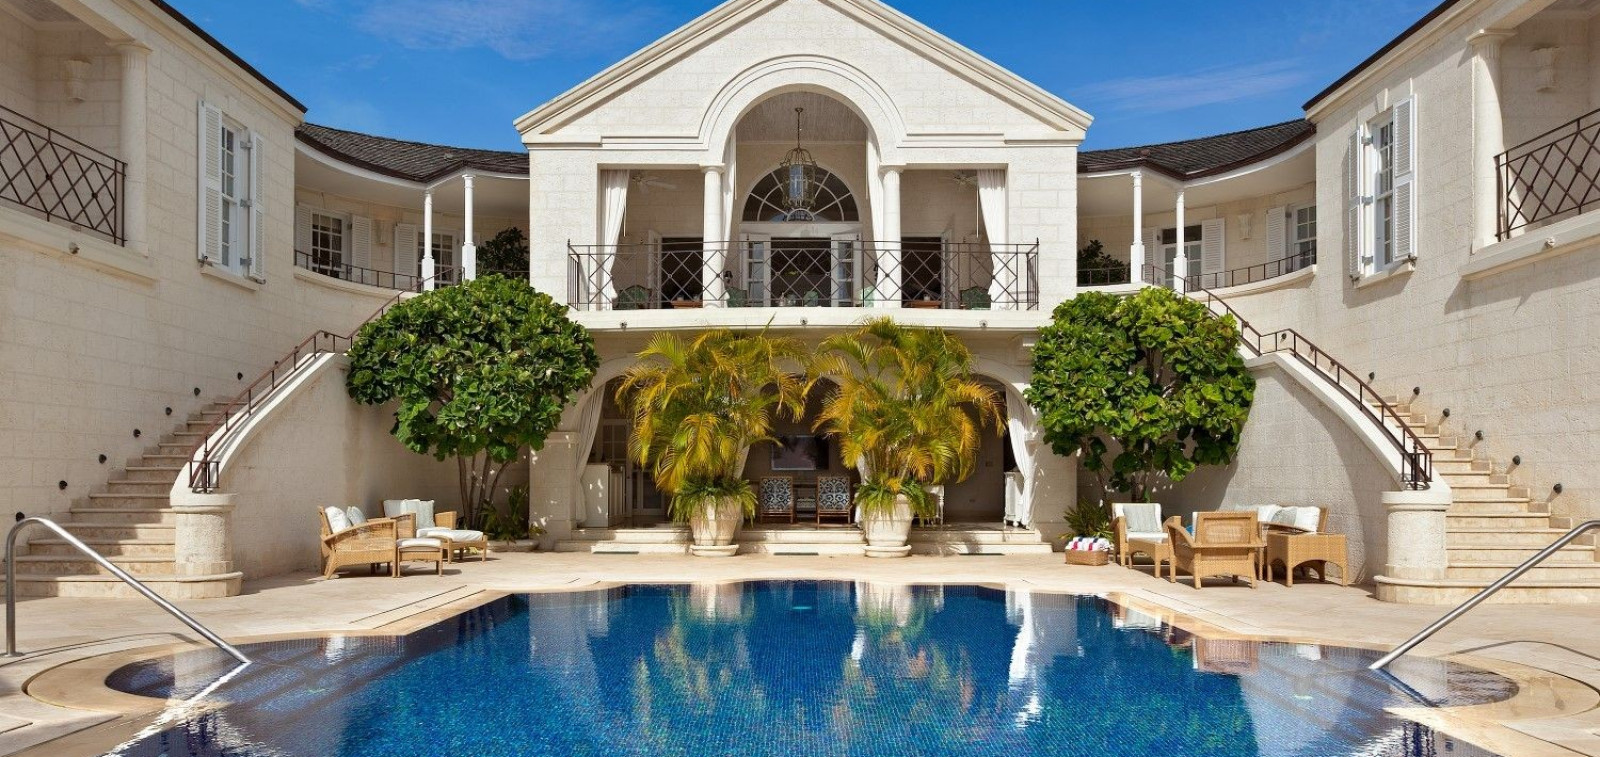 Beautiful Villa Like Dynasty for Rent 5 Bedroom Villa Sugar Hill with Putting Green & Sea Views